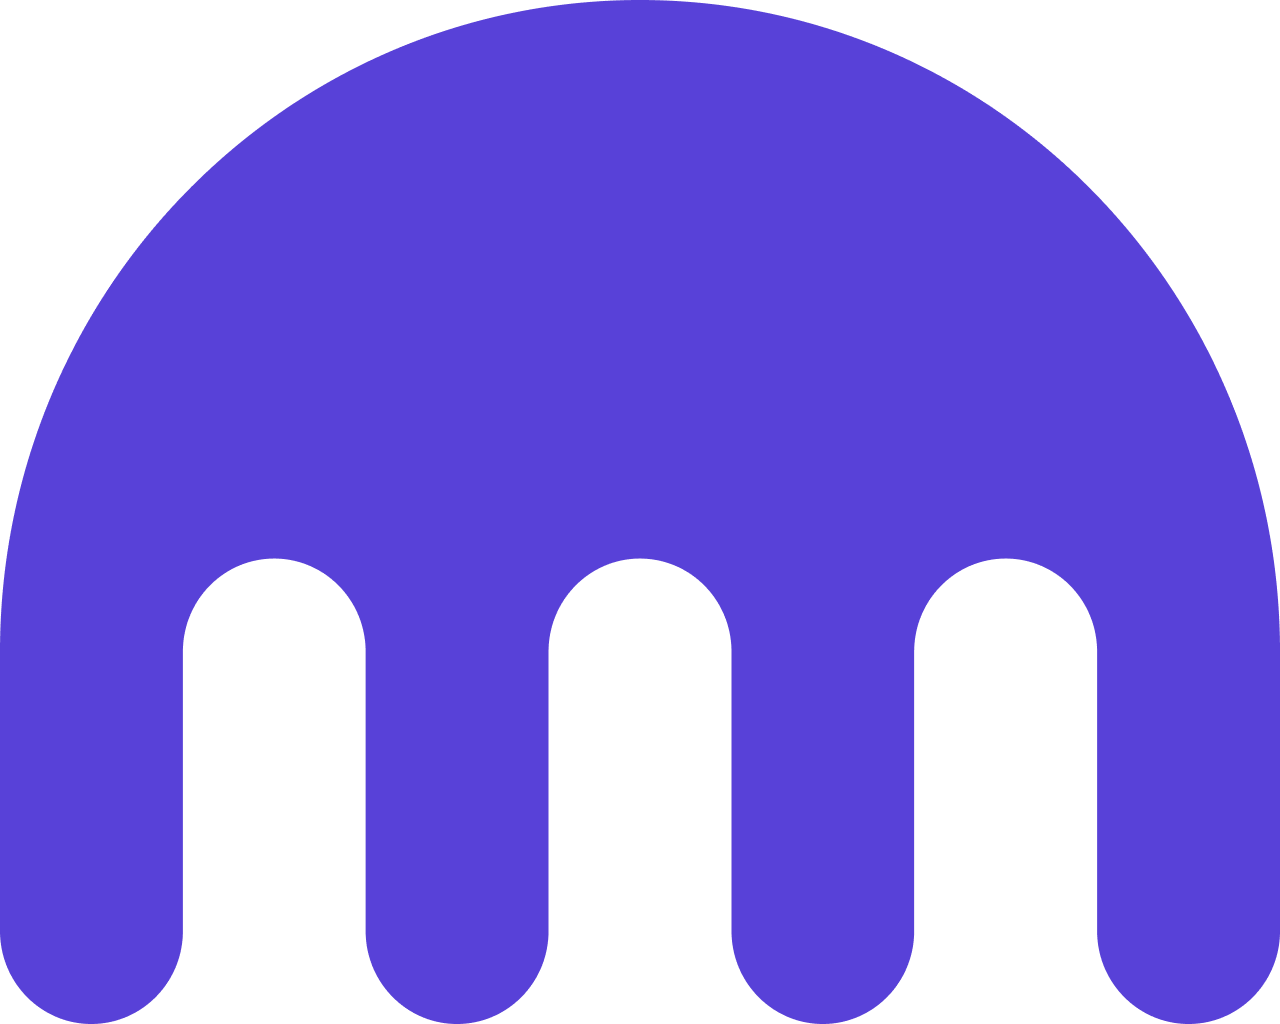 Senior Mobile Software Engineer - Cryptowatch